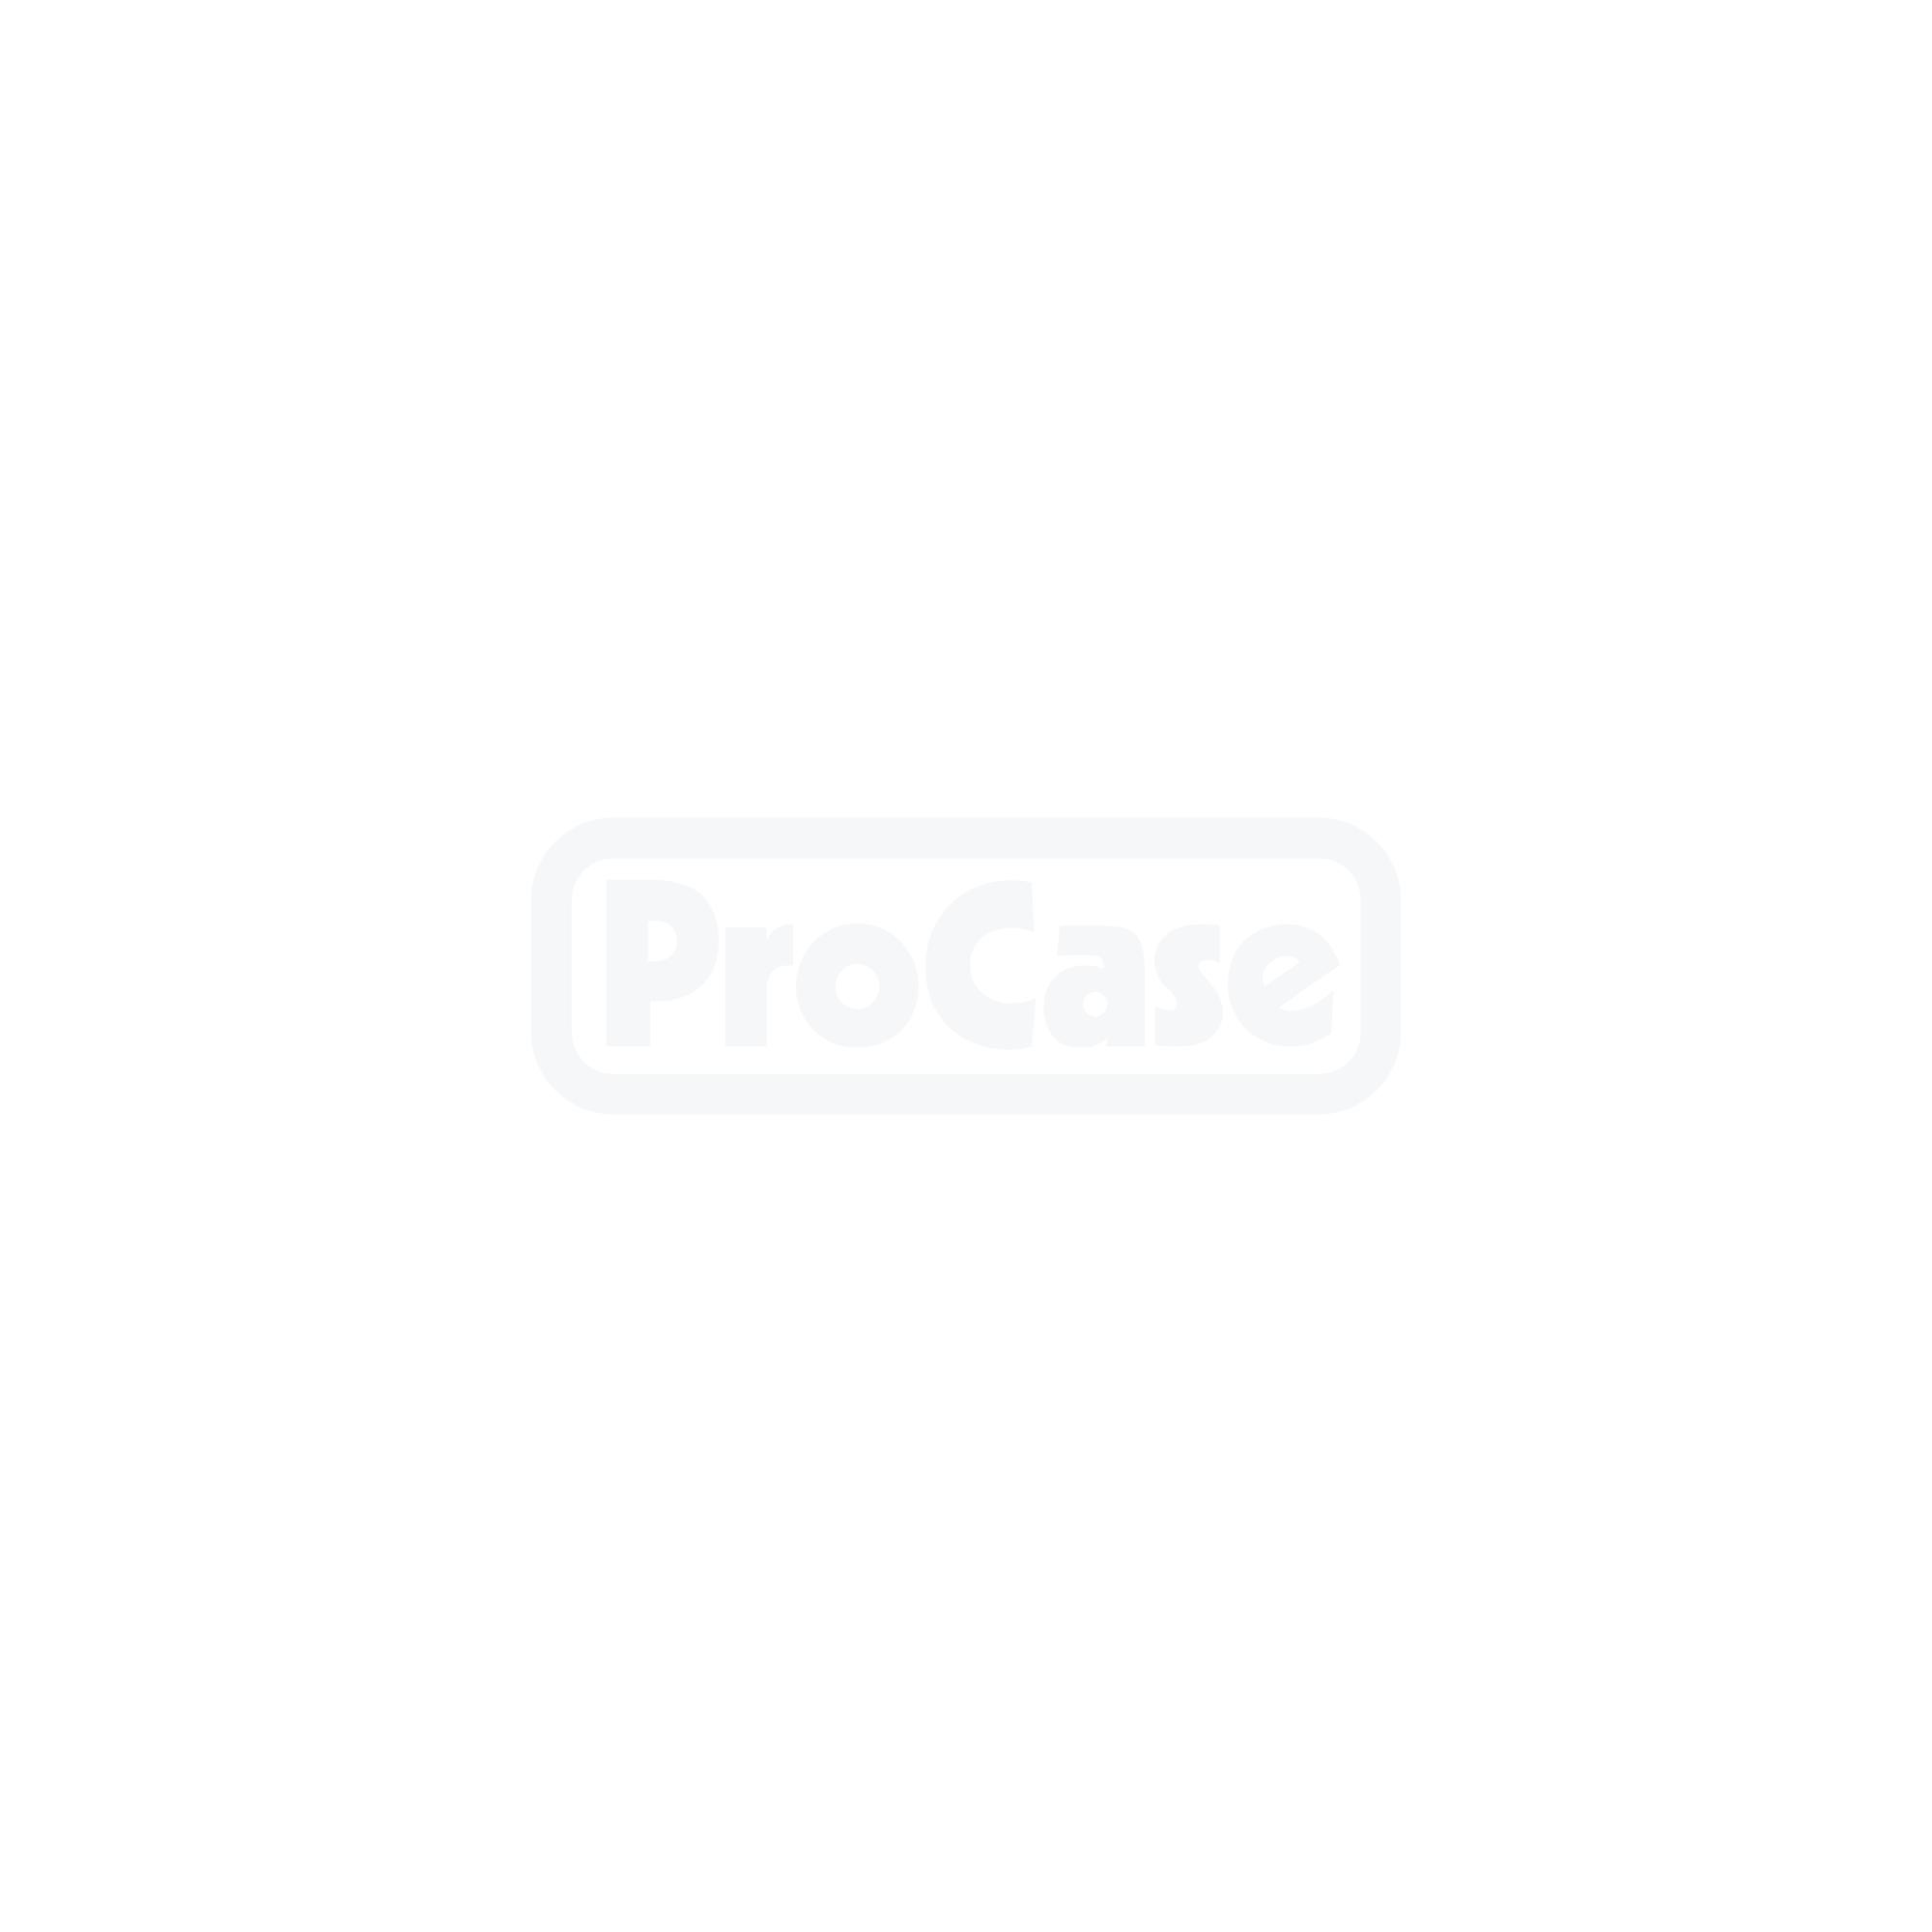 Transporkoffer für Sanyo PLC-XU78